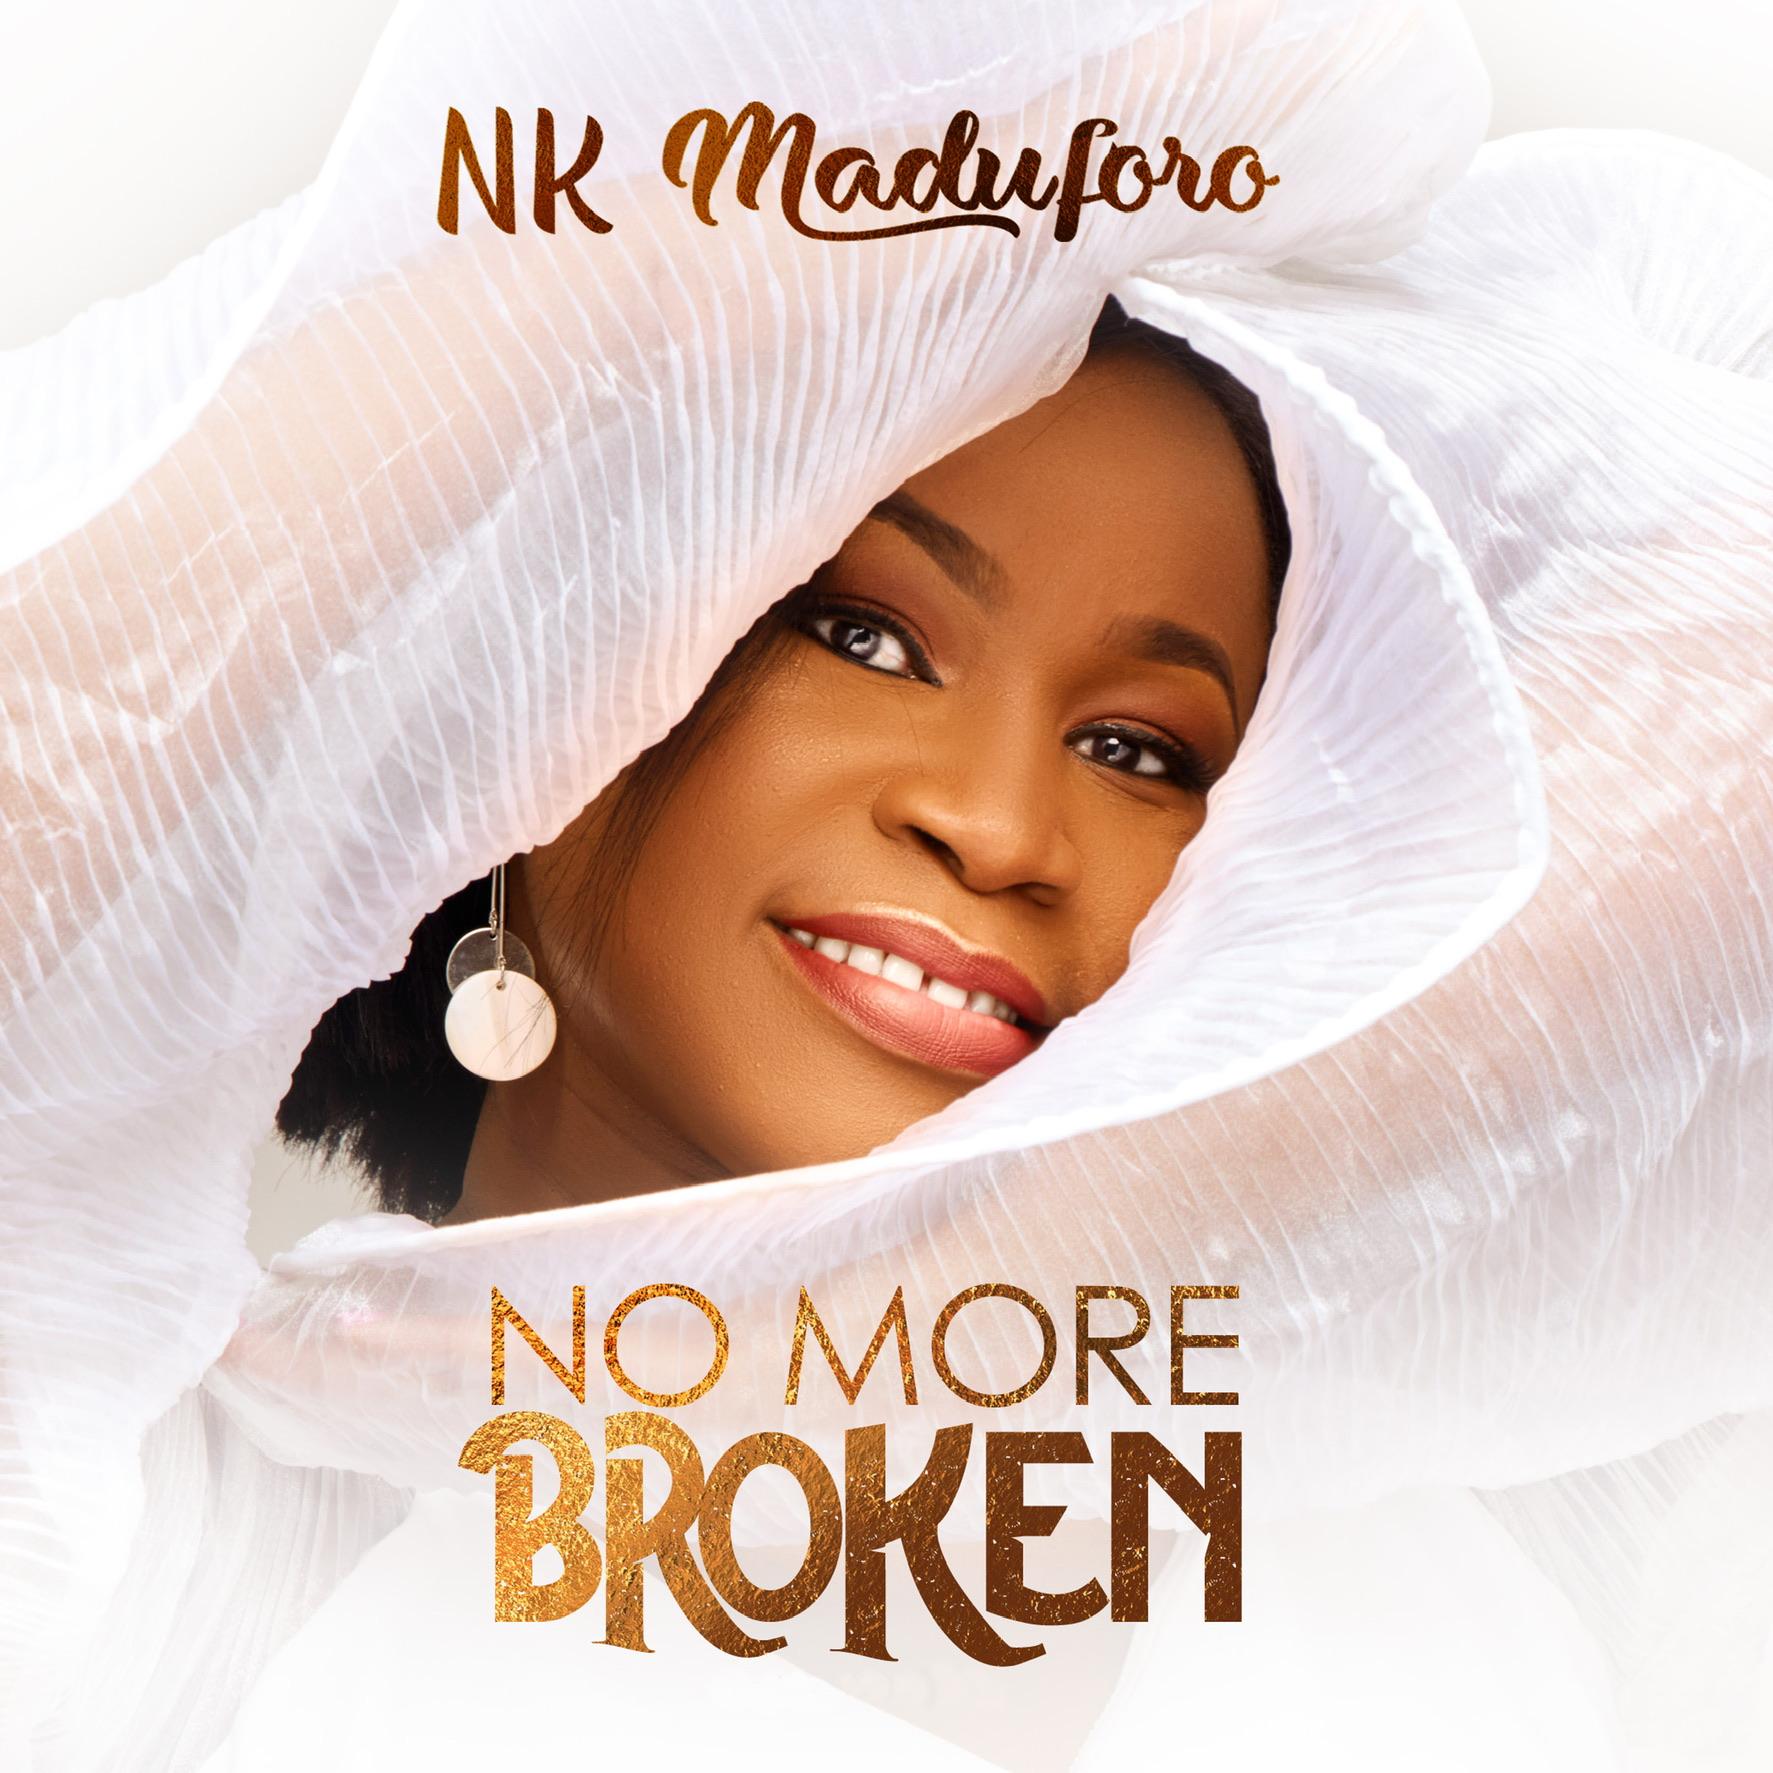 Download NK Maduforo - No More Broken